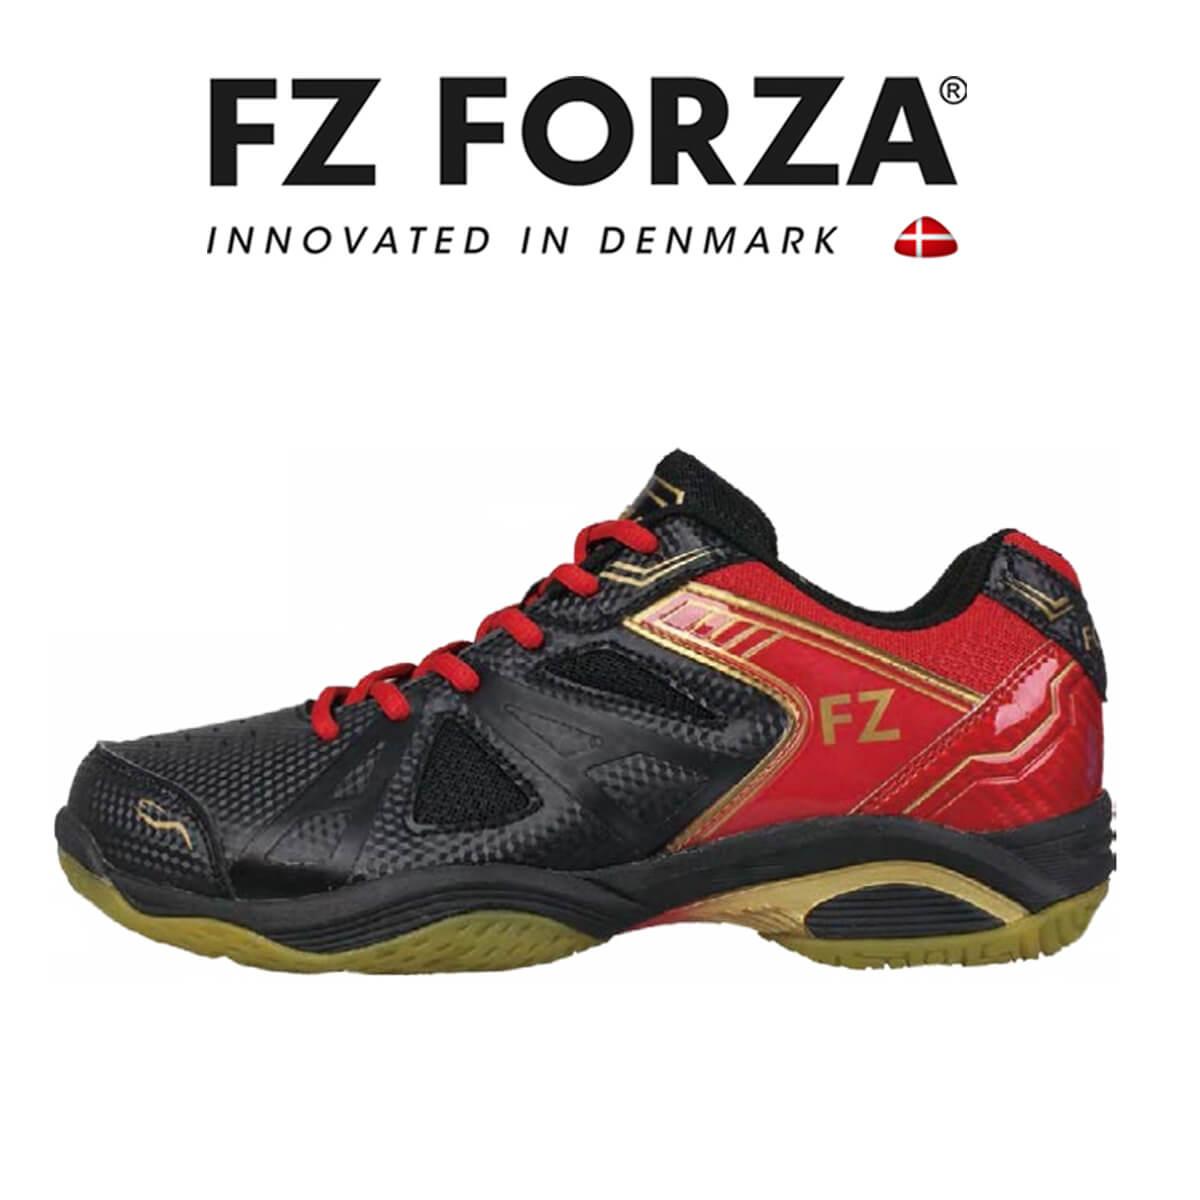 FZ FORZA 302611 バドミントンシューズ(ユニ/メンズ) フォーザ【日本バドミントン協会審査合格品】